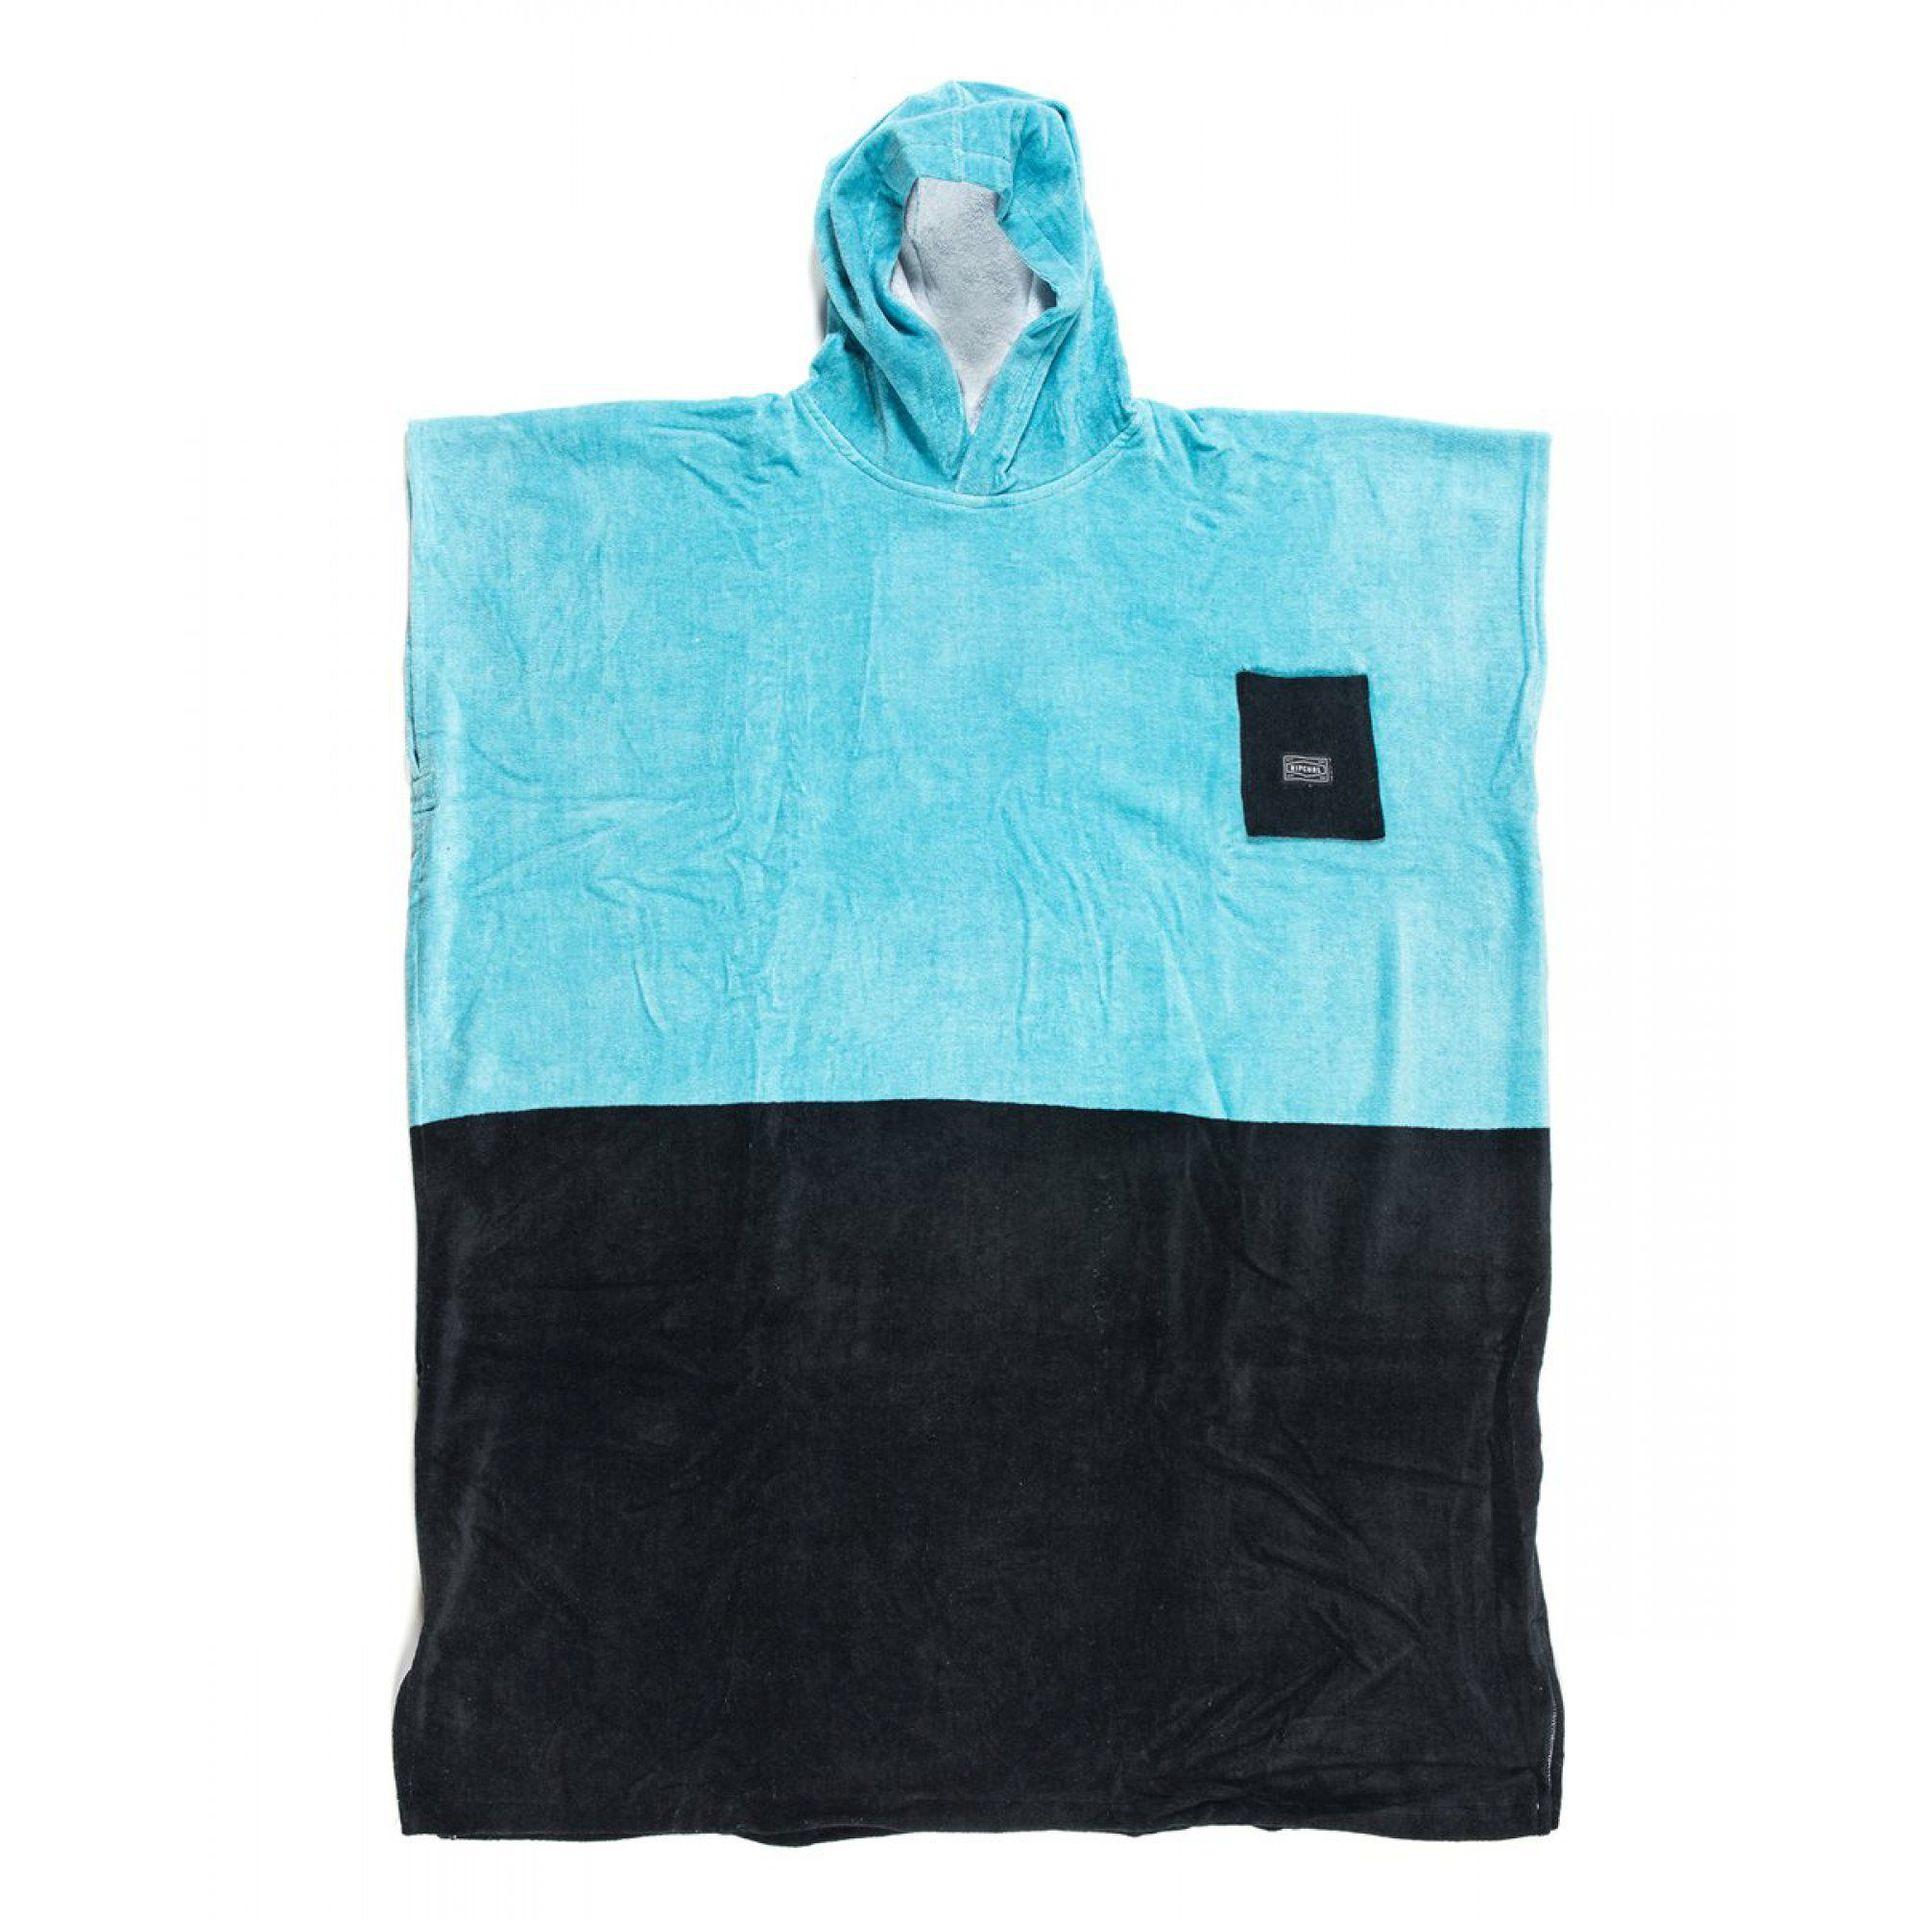 PONCHO RĘCZNIK RIP CURL CLASSIC PONCHO BOY 9427 NILE BLUE